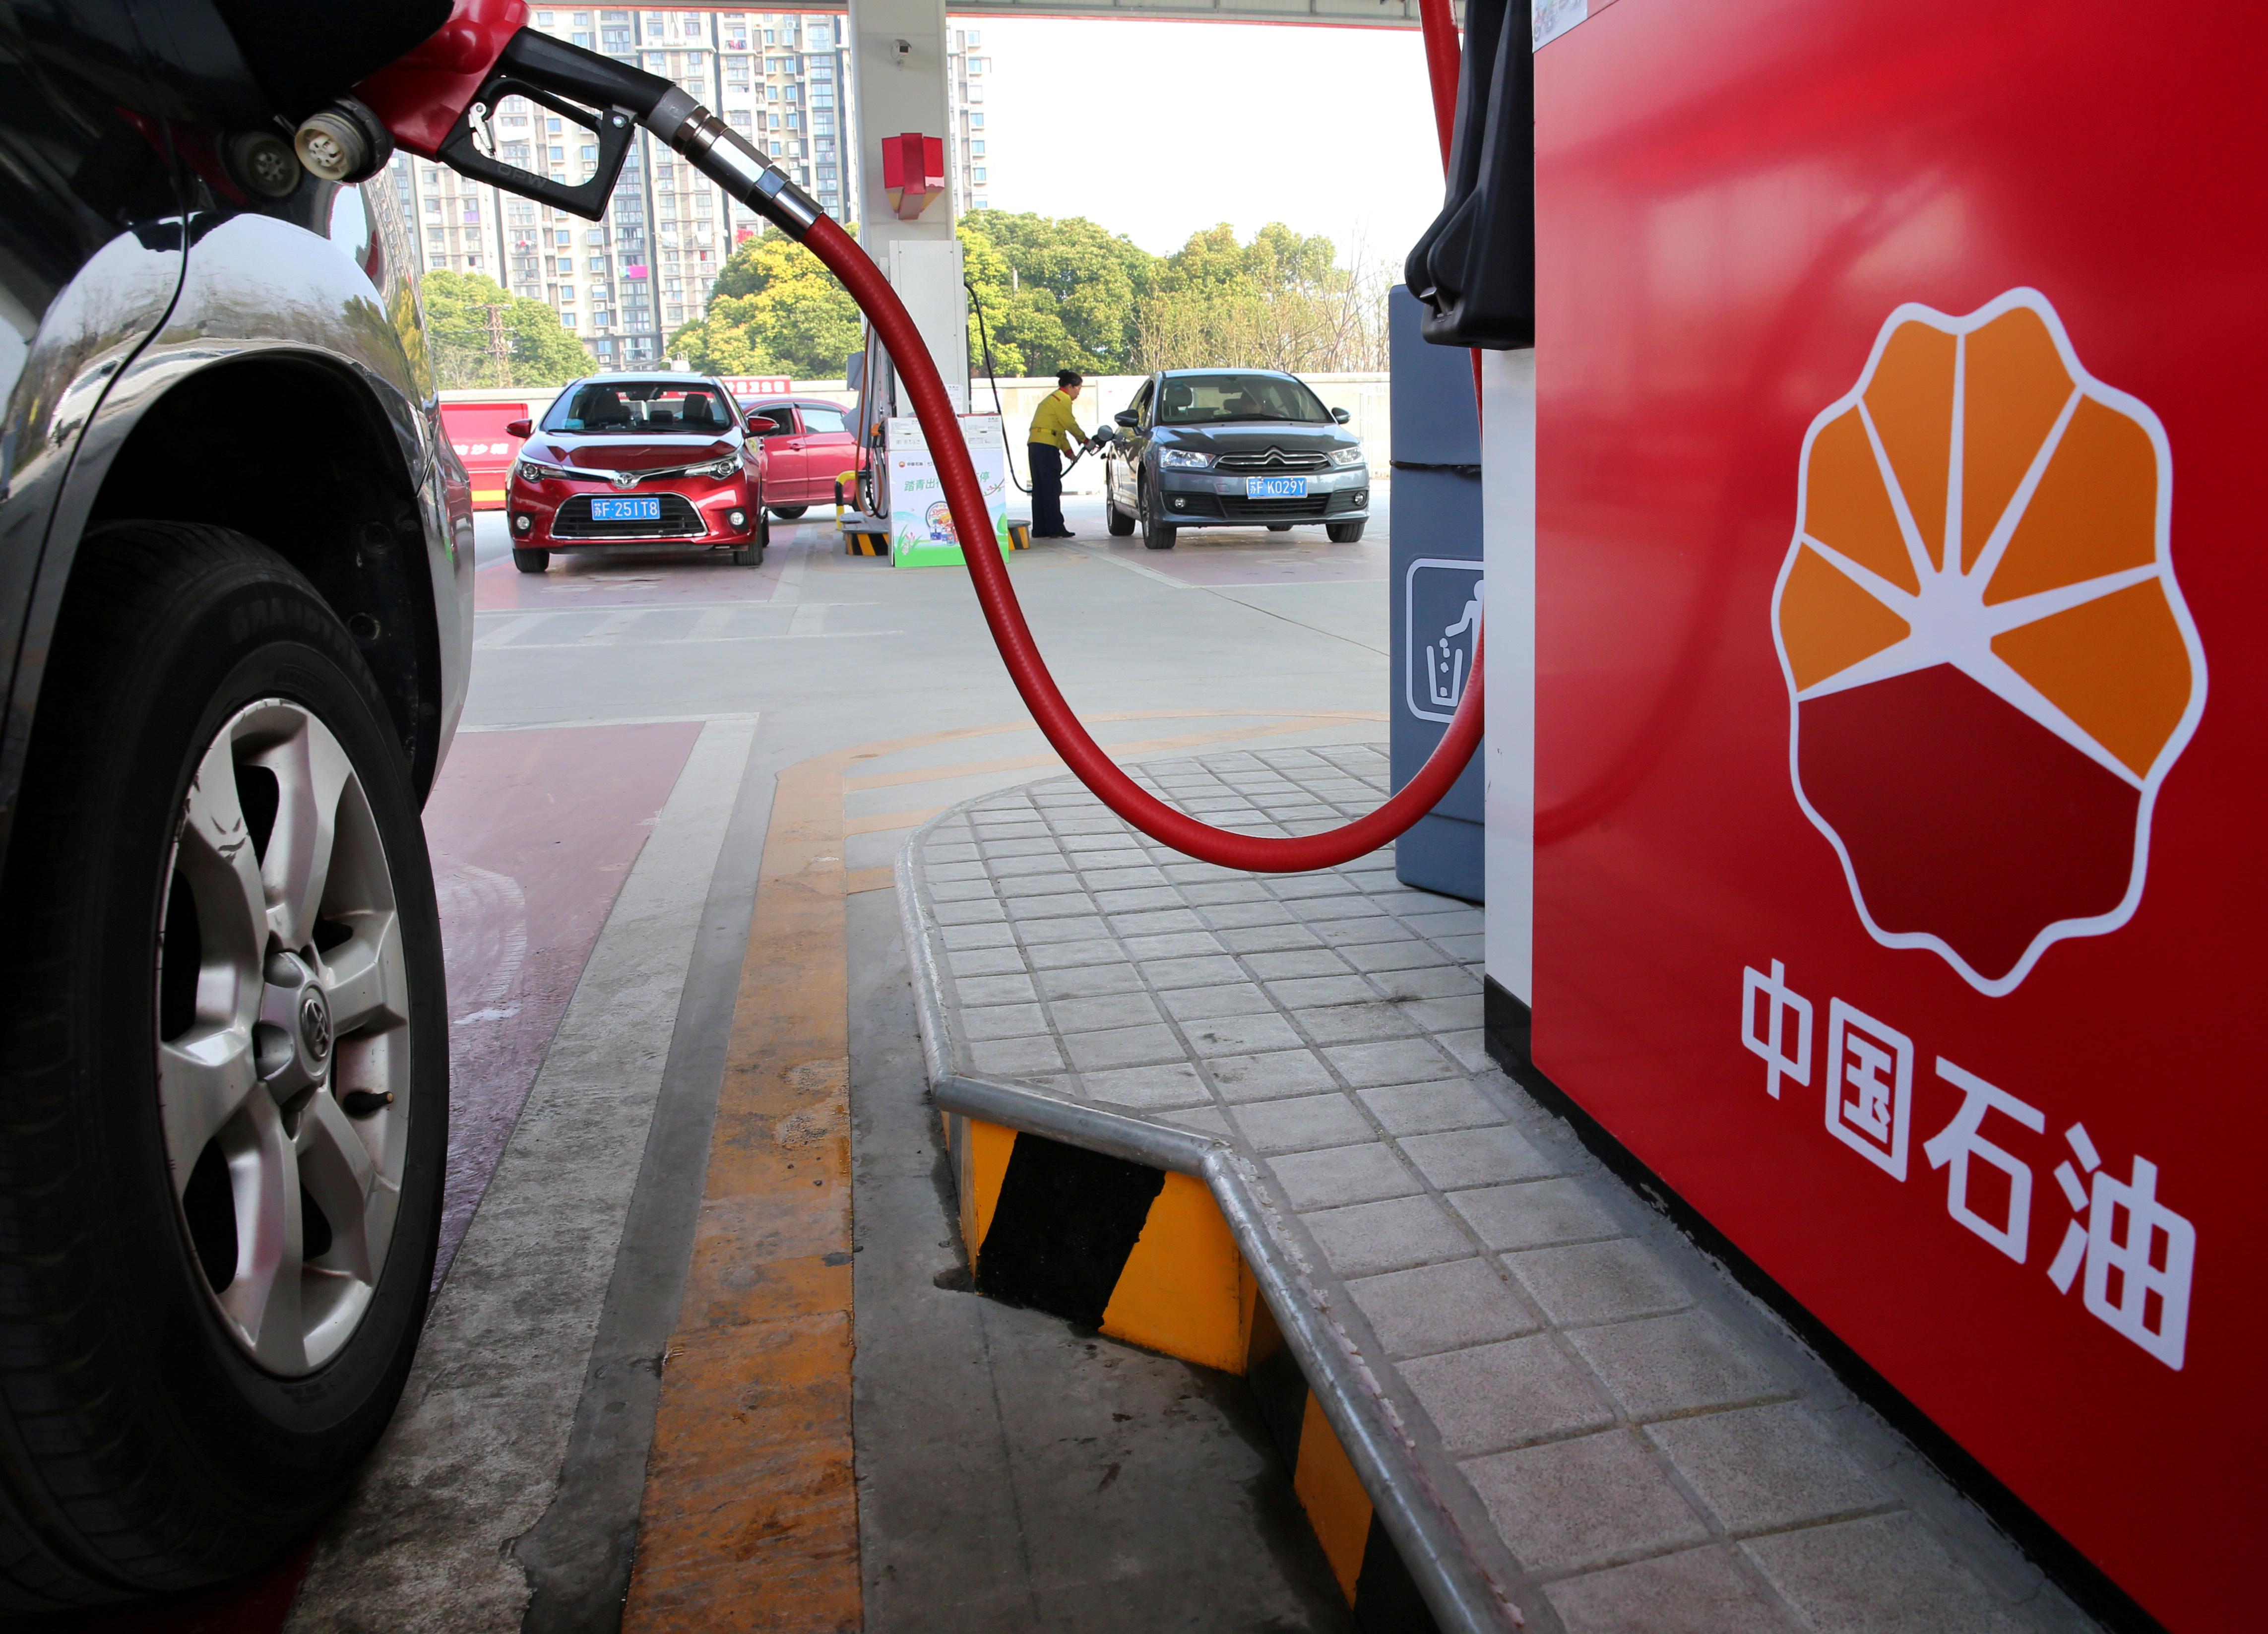 PetroChina's logo is seen at its petrol station in Nantong, Jiangsu province, China March 28, 2018. REUTERS/Stringer